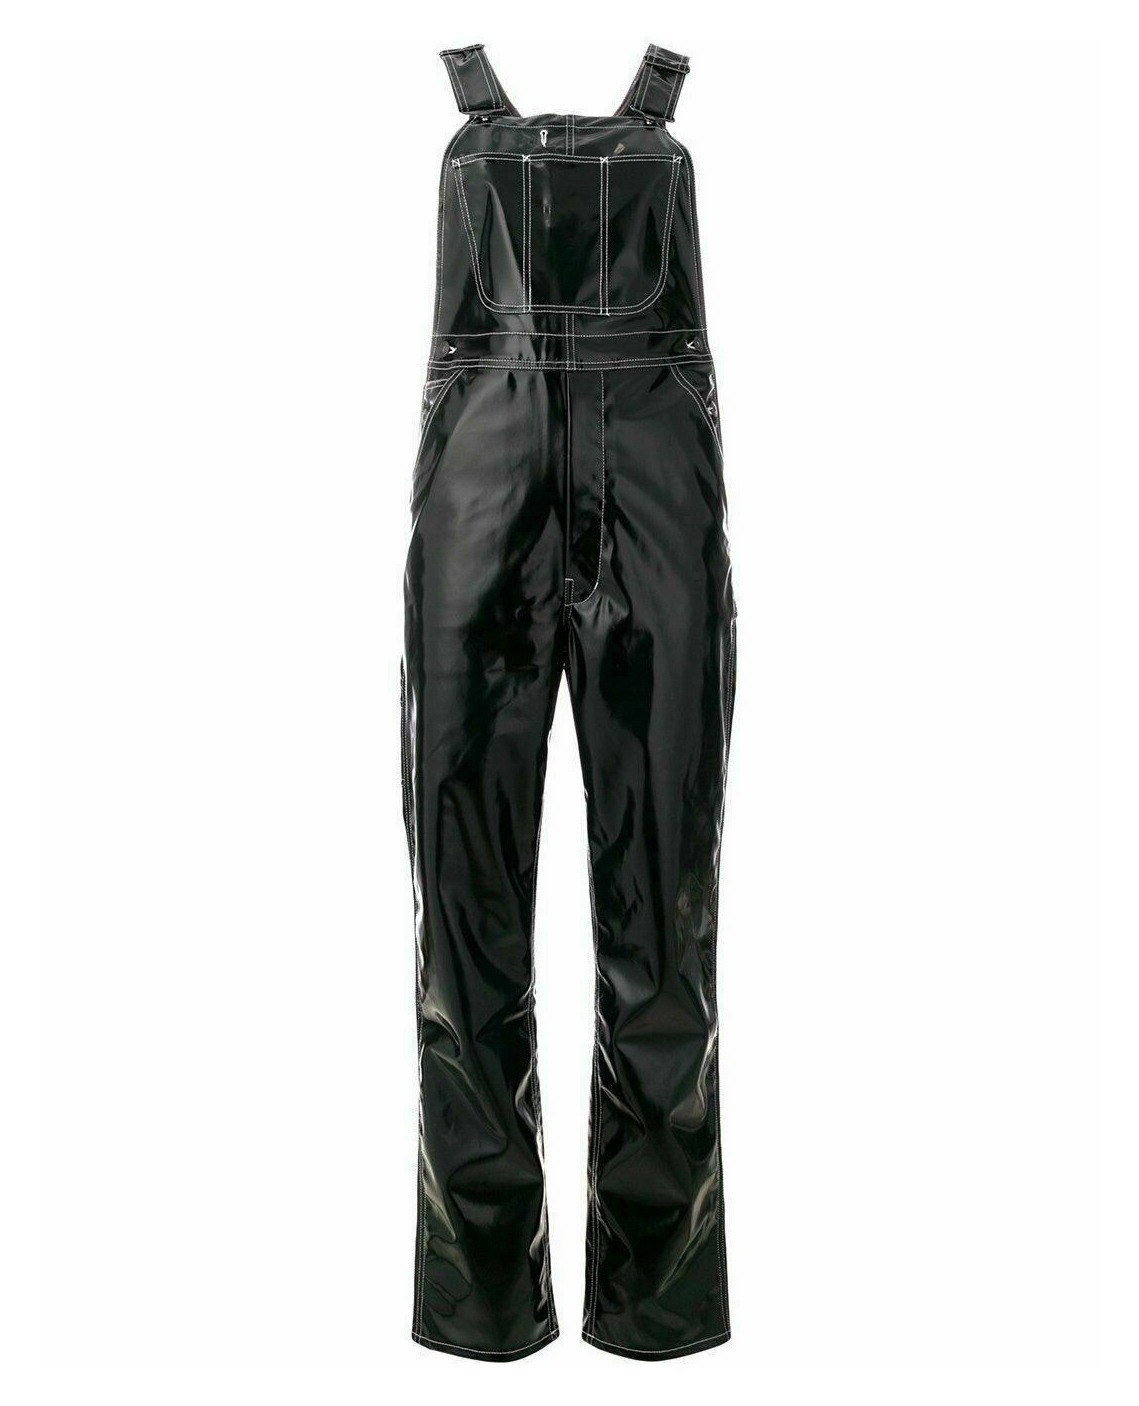 Women Vinyl Black Jumpsuit Romper Play suit PVC, Leather-Shortall,Pinafore Dress